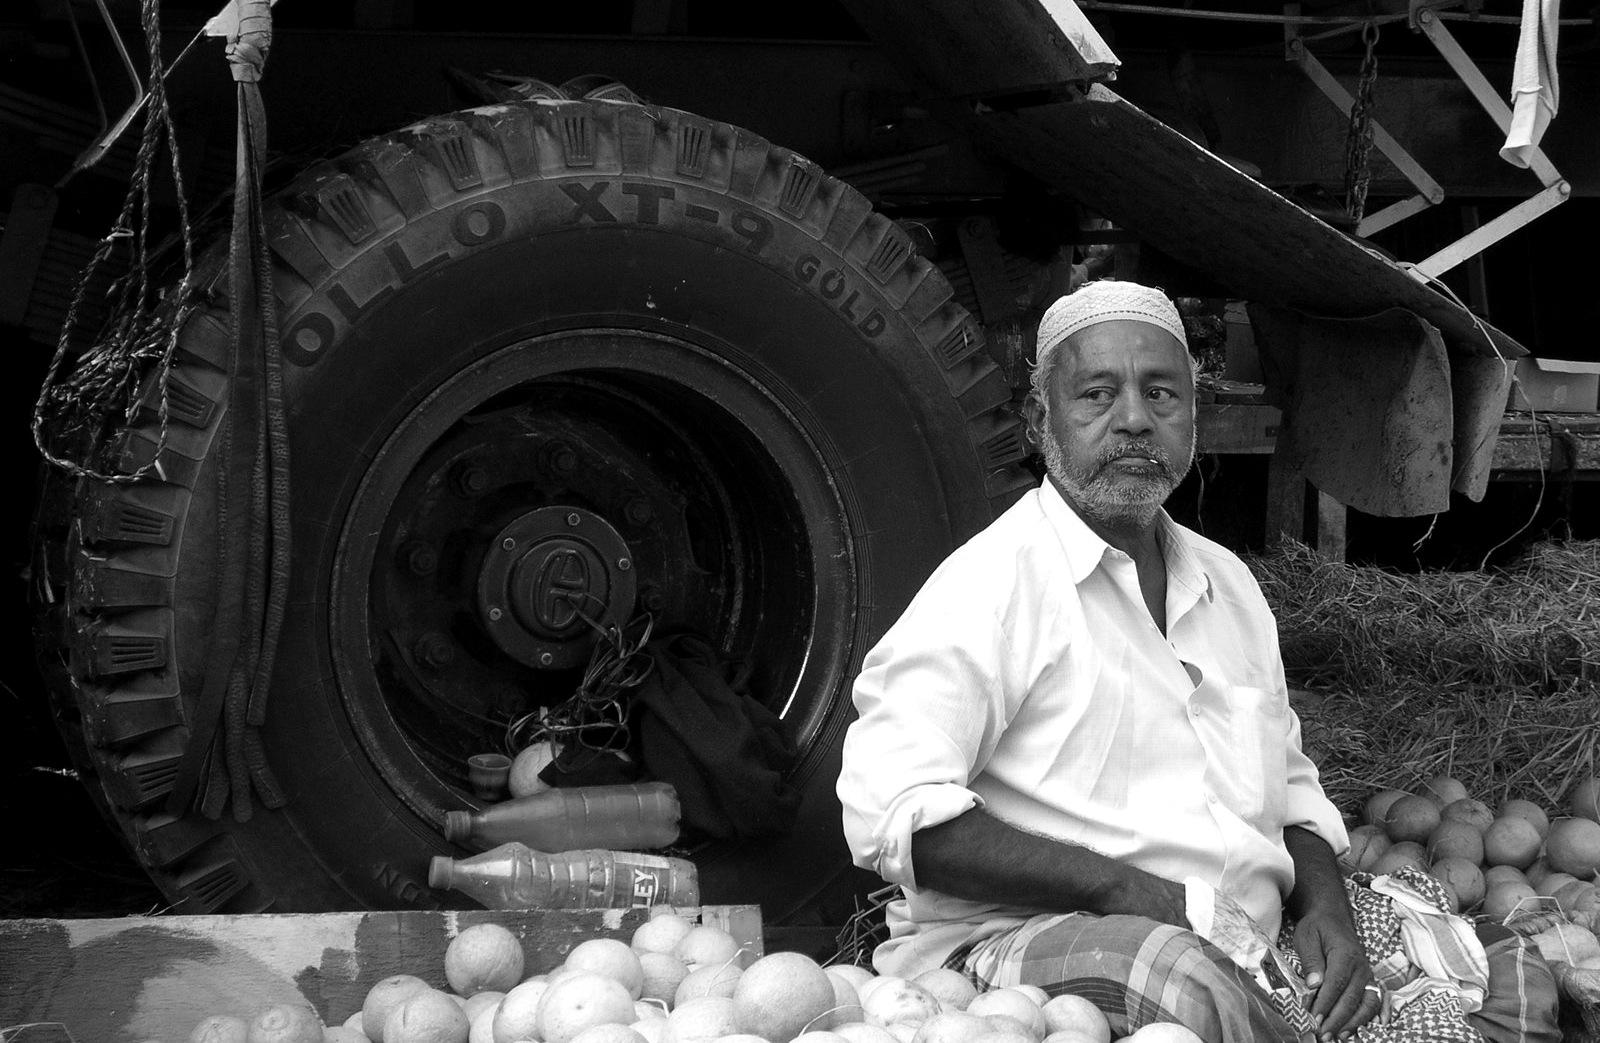 Fruit-seller by anishgupta